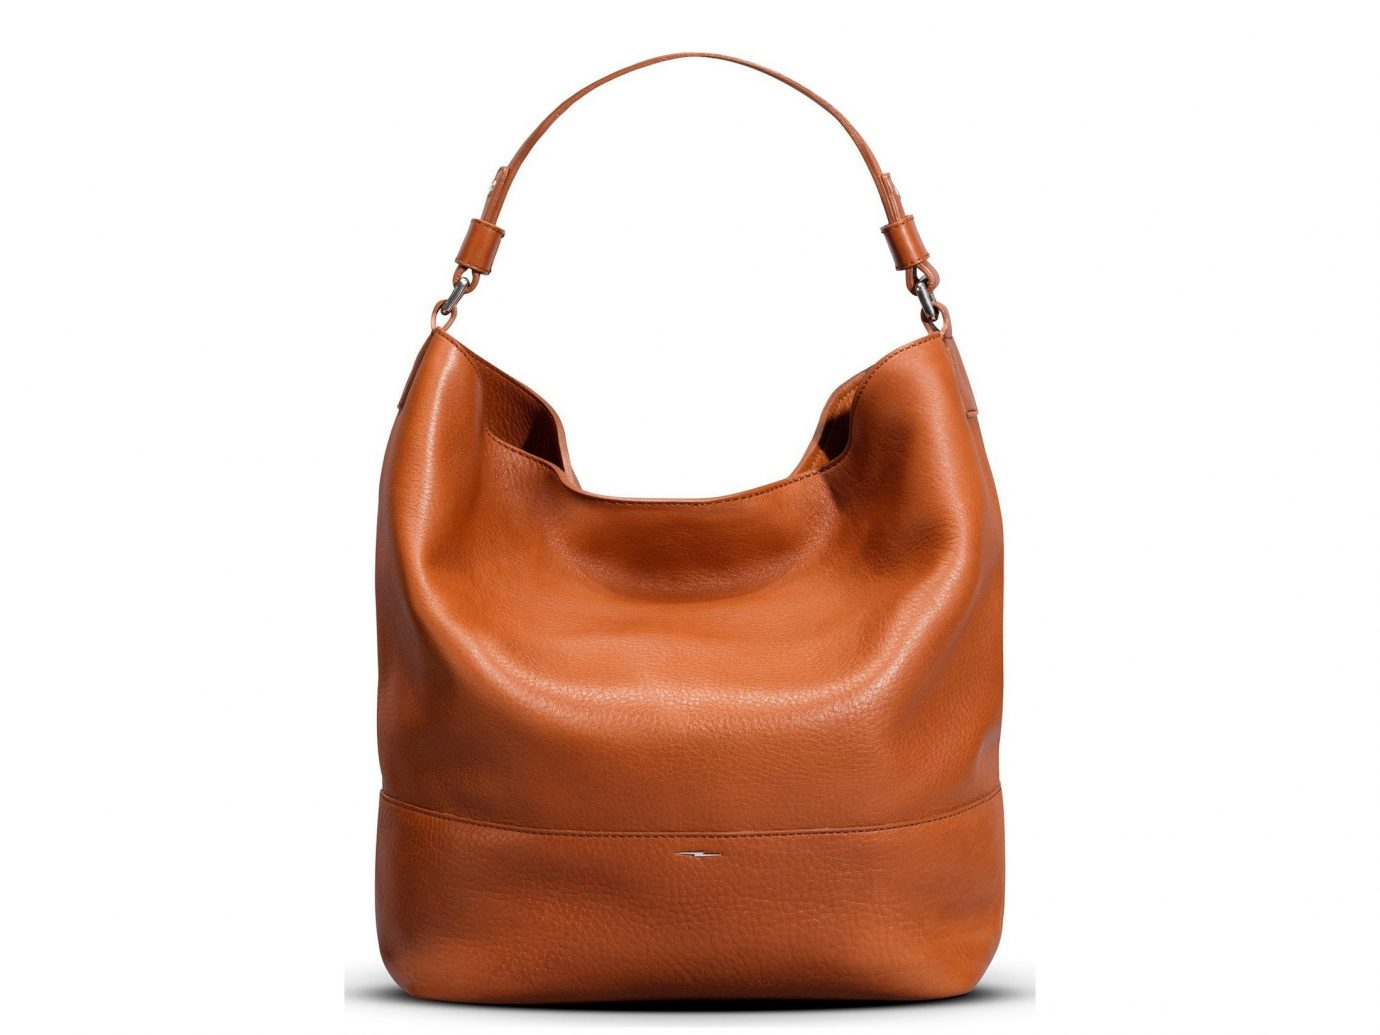 Packing Tips Style + Design Travel Shop Weekend Getaways bag shoulder bag brown accessory leather handbag orange hobo bag fashion accessory caramel color peach product product design